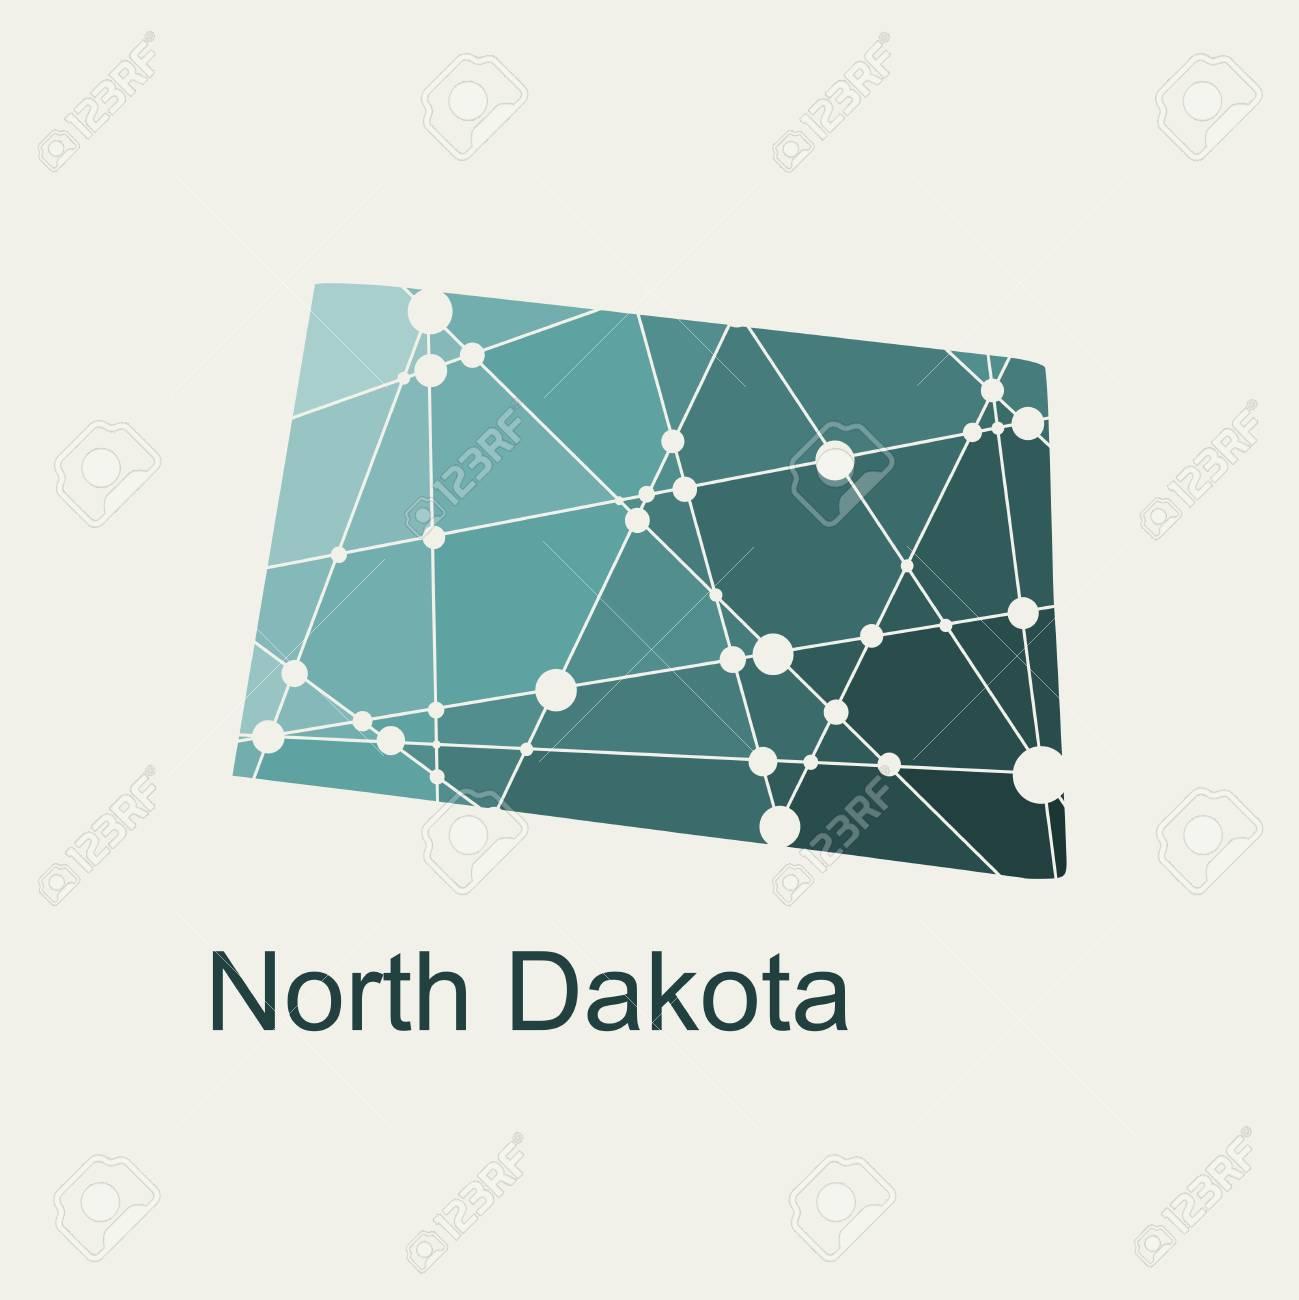 Image Relative To USA Travel. North Dakota State Map Textured ...